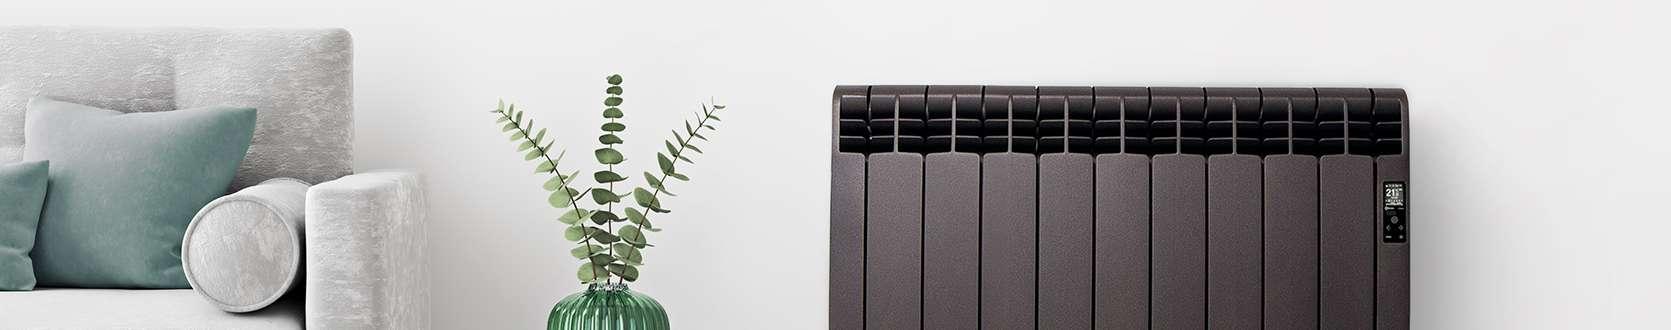 Black D Series wifi radiator in living room